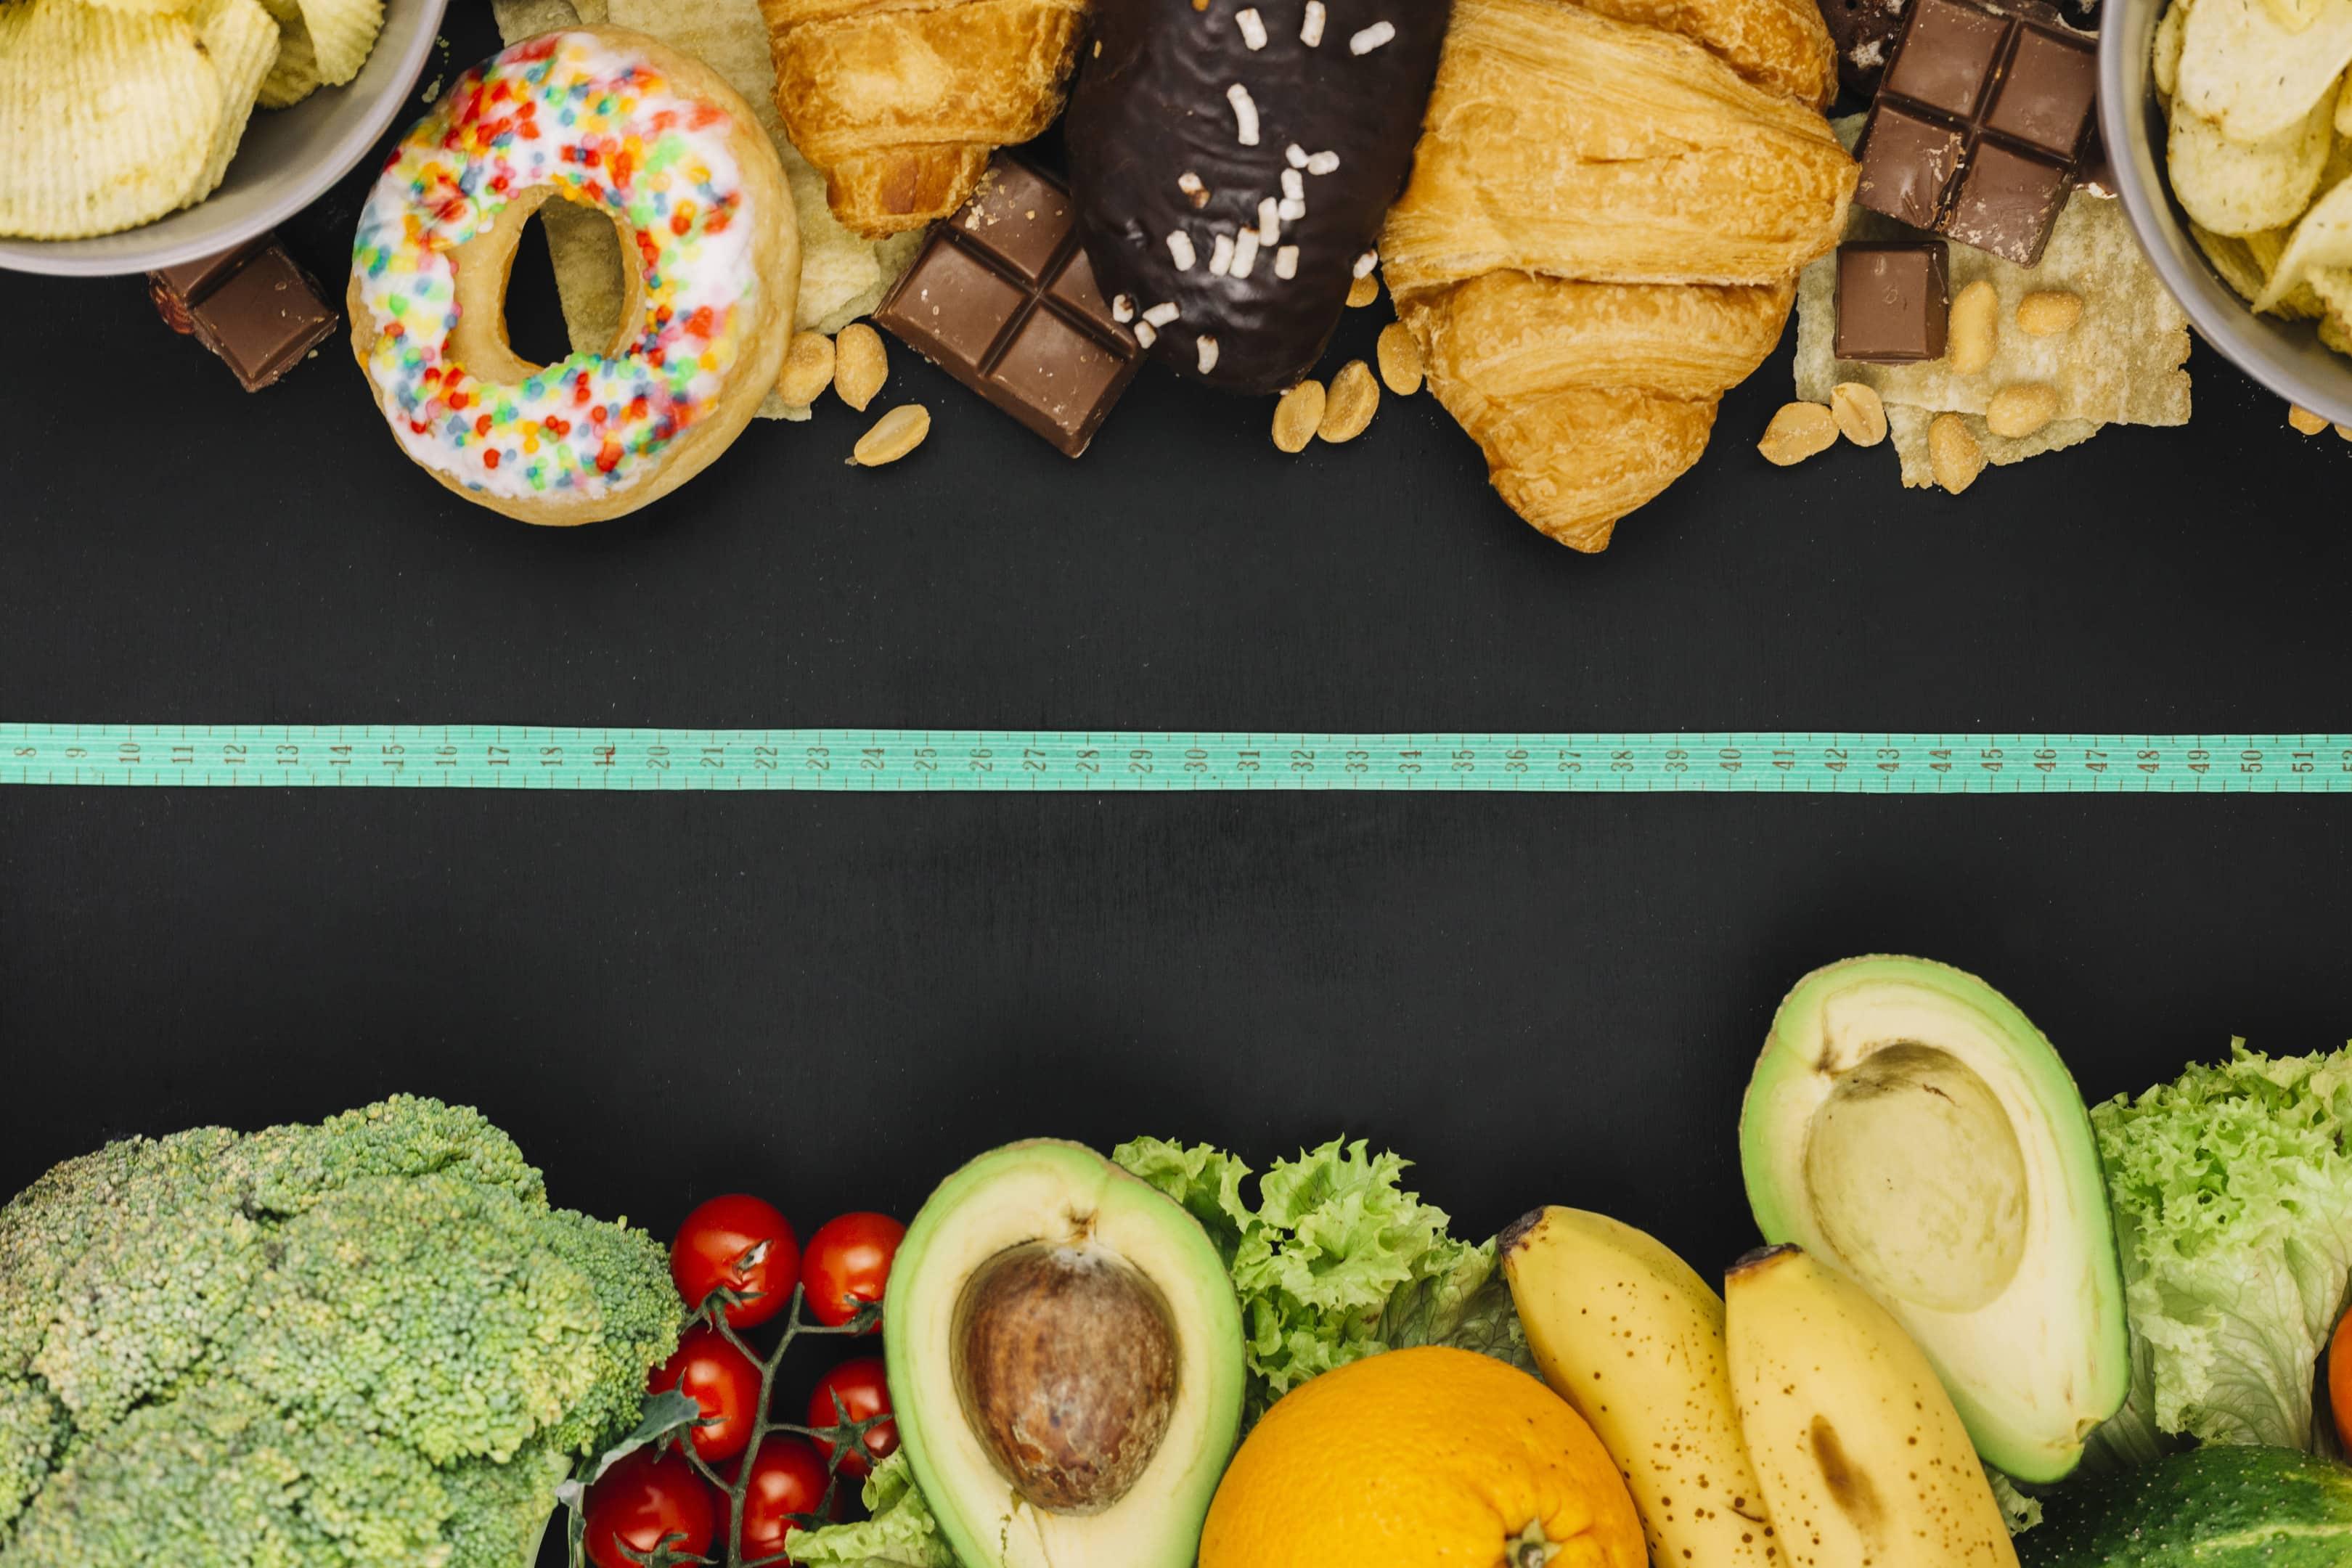 Low fat food vs high fat food